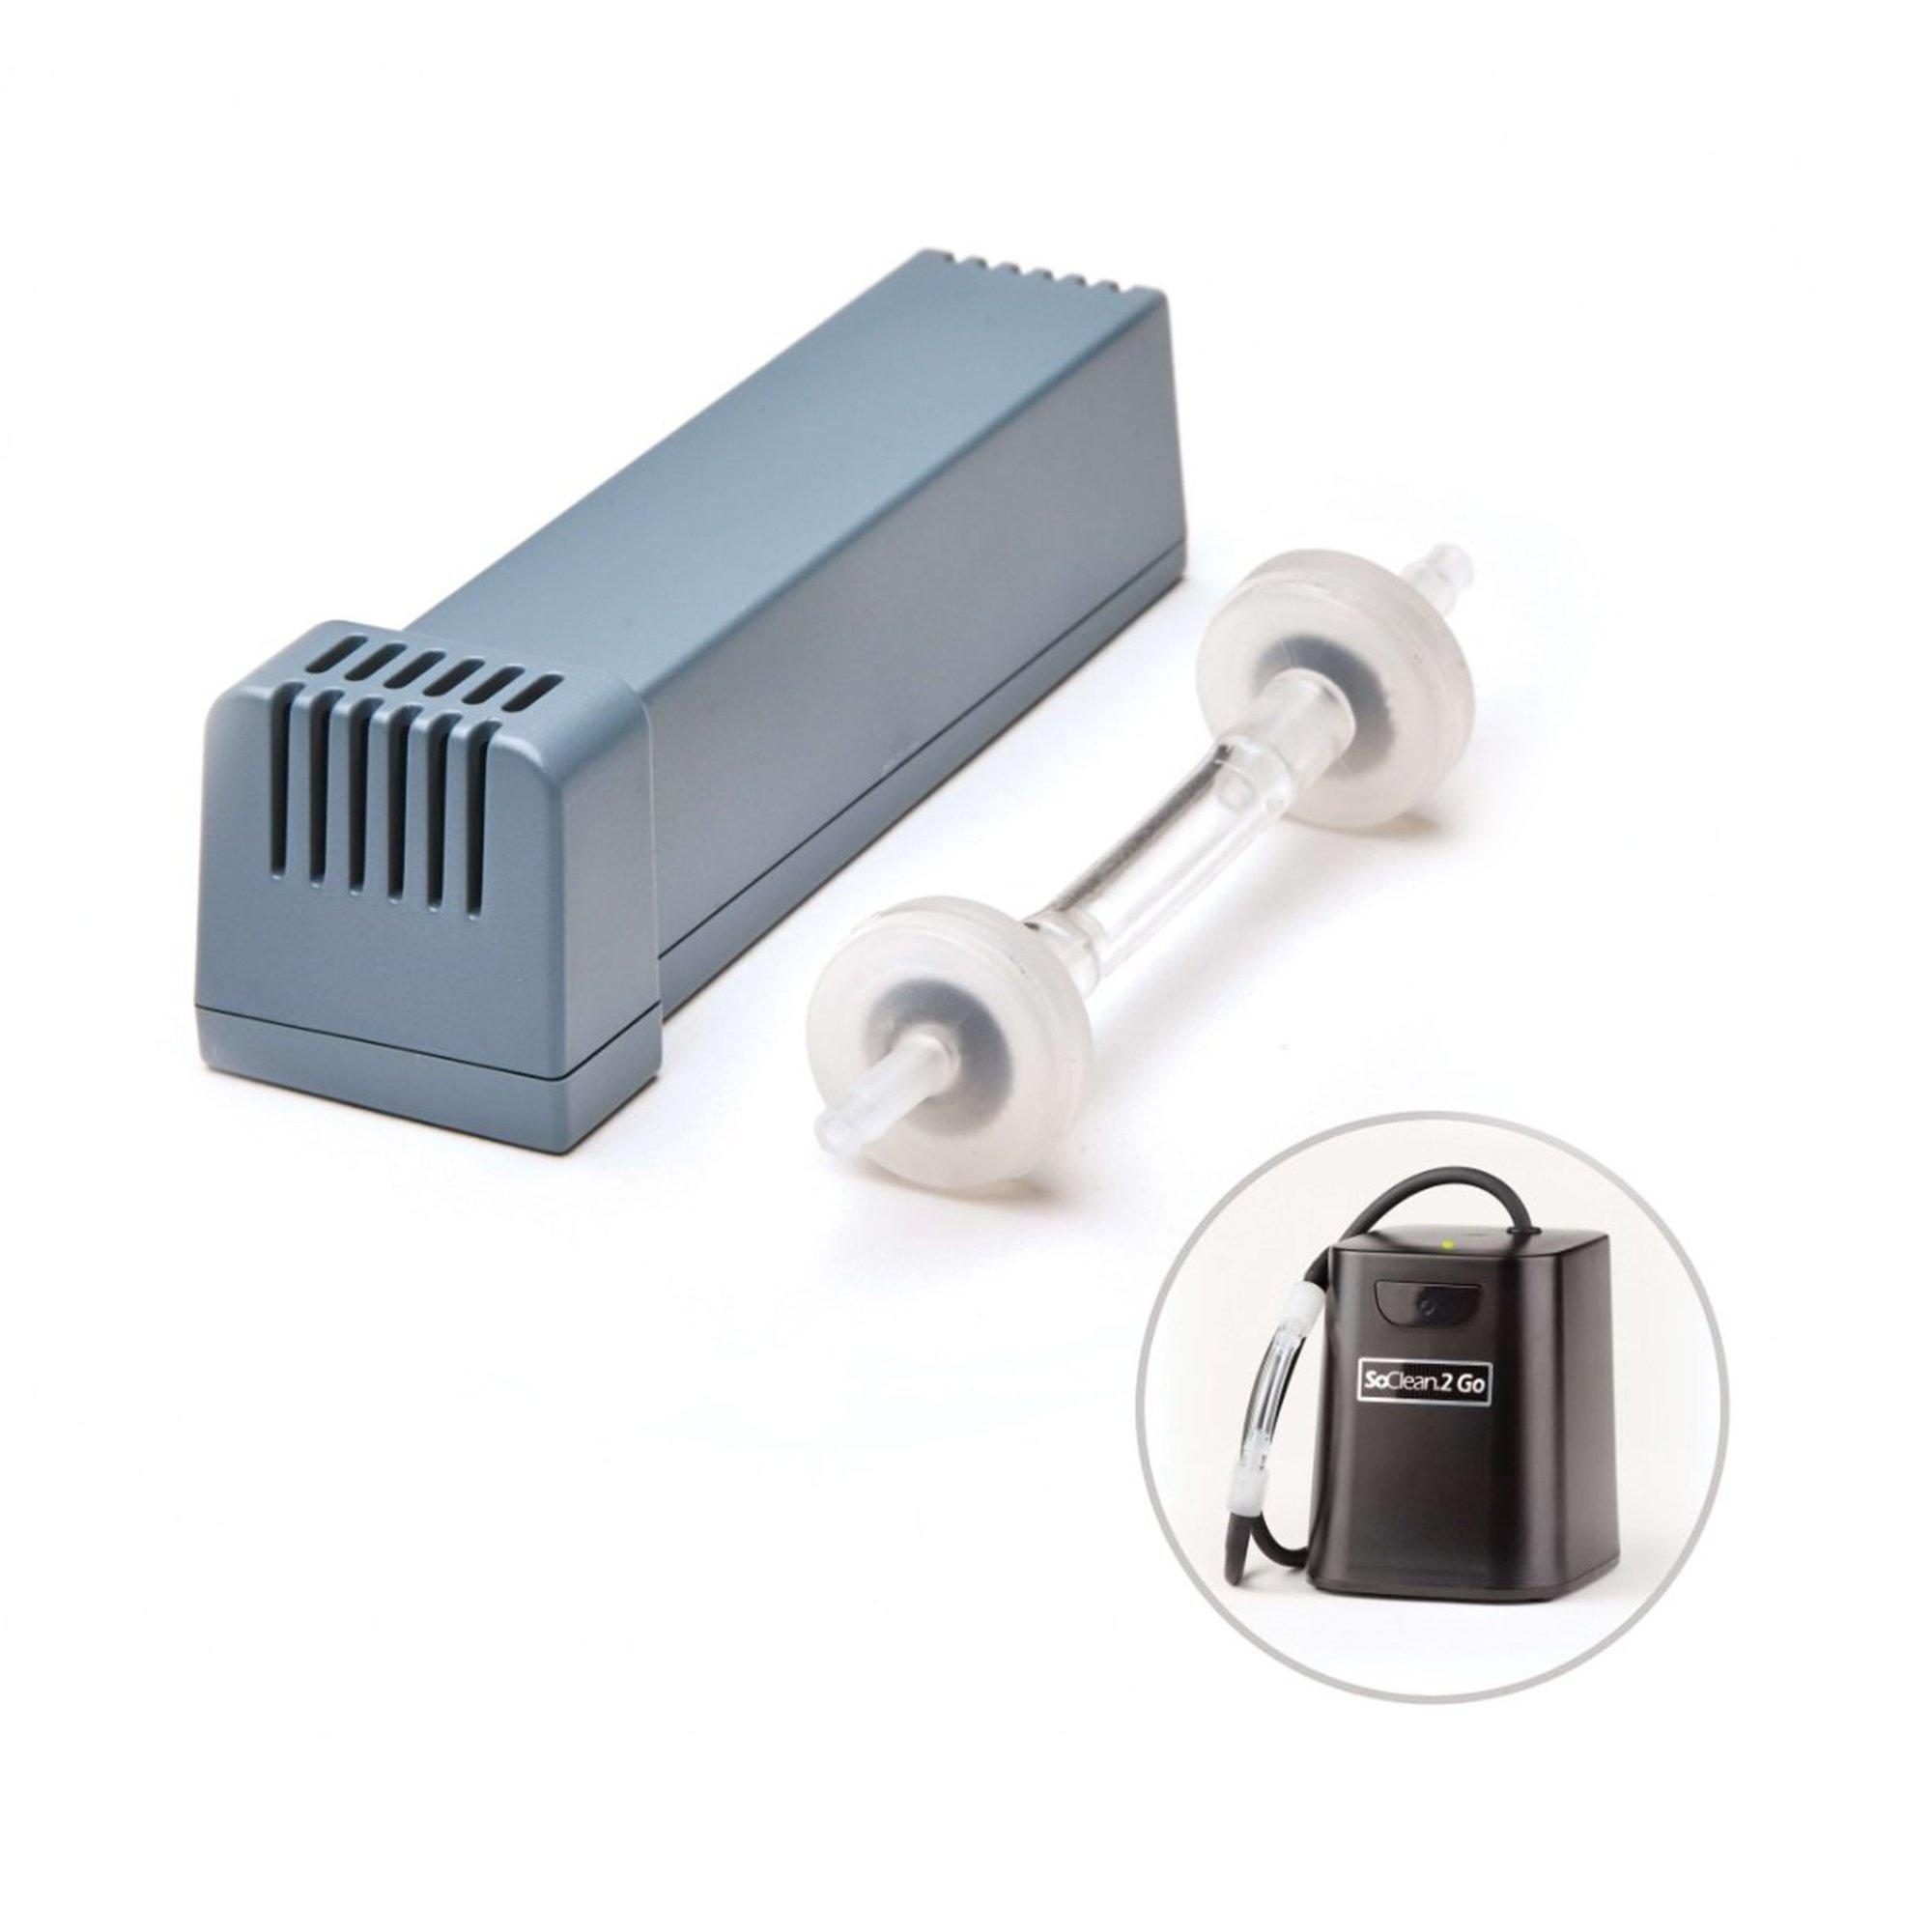 SoClean 2 Go Cartridge Filter Kit, PN1307, 1 Each